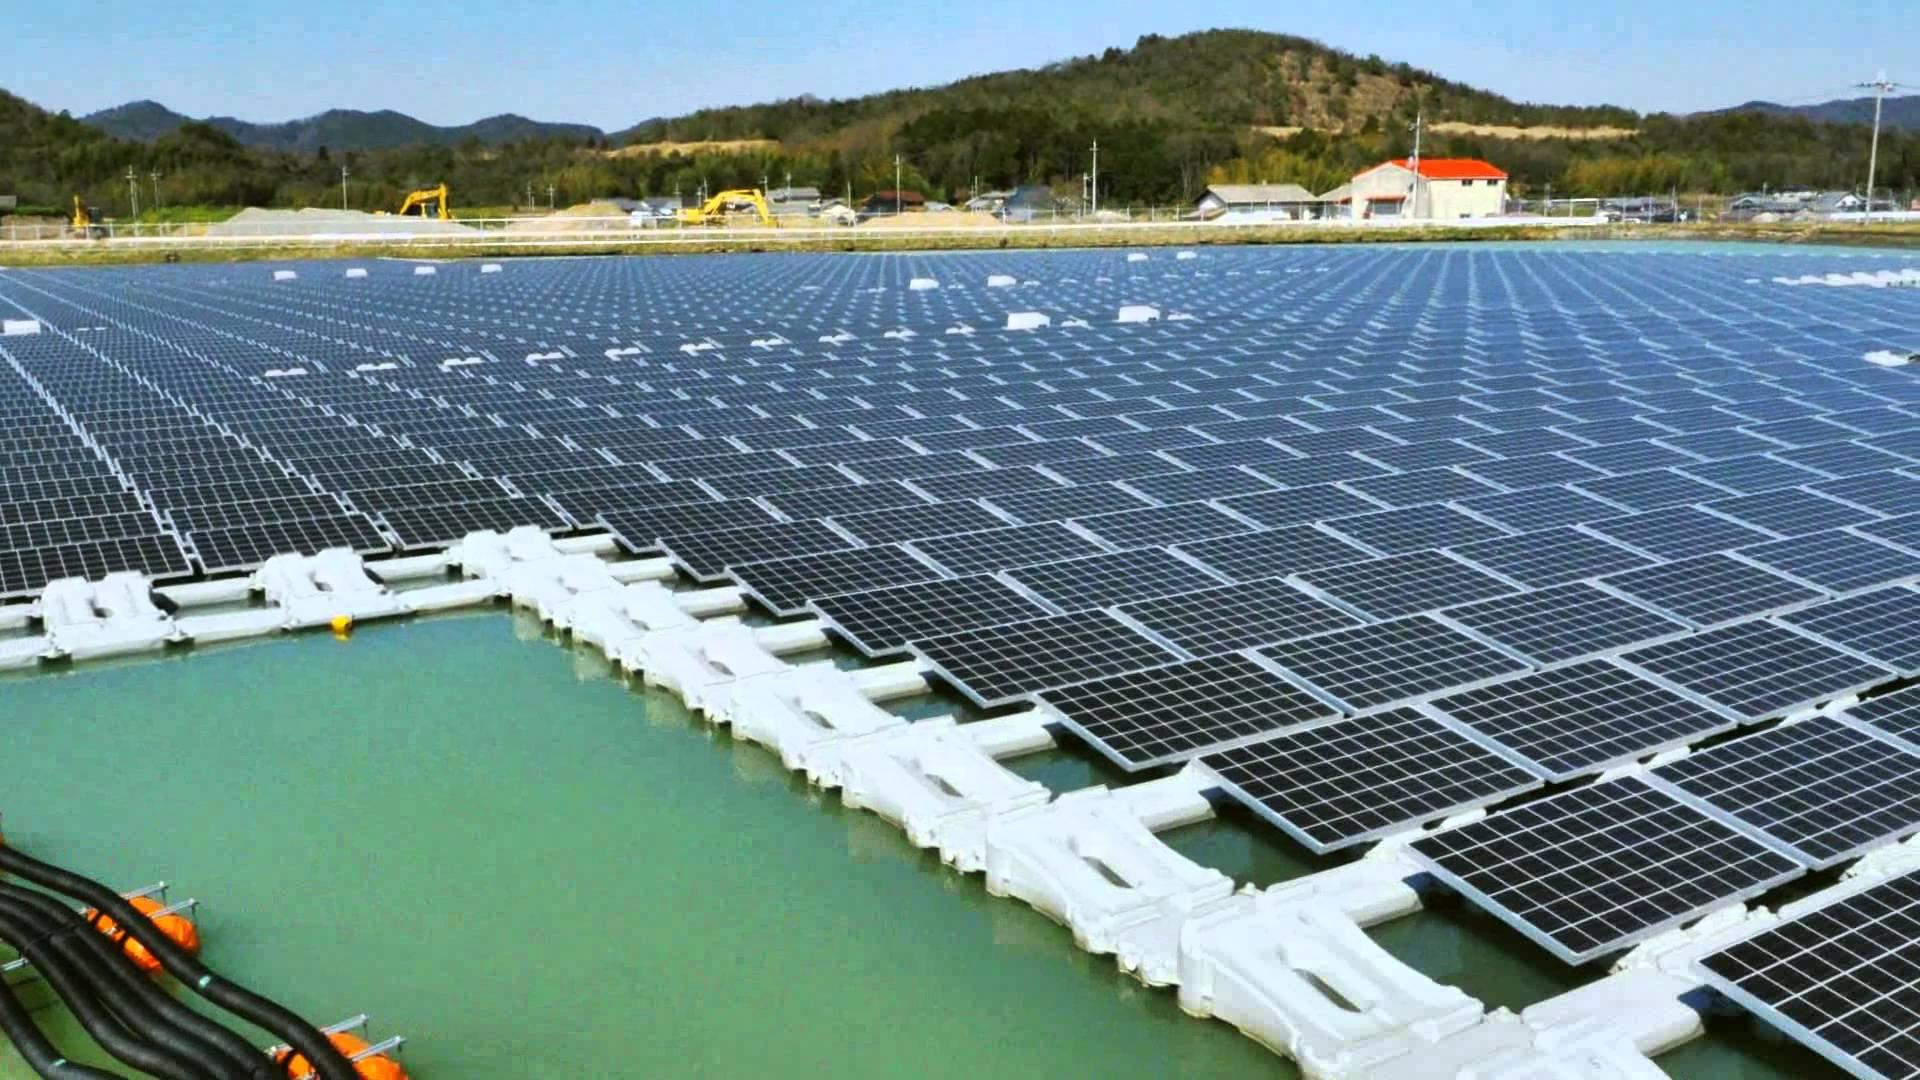 Floating solar power